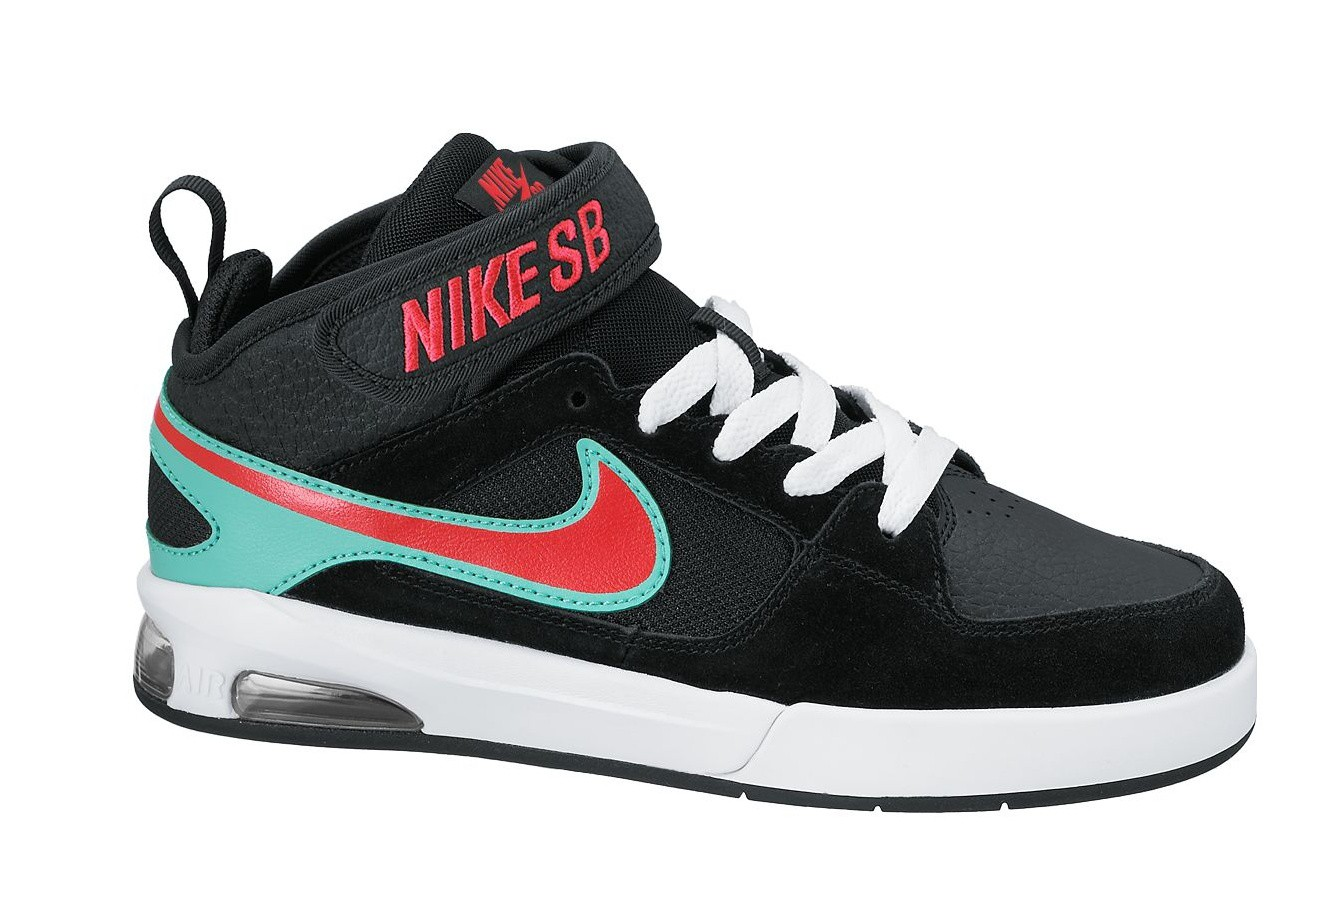 Dětské boty Nike AIR SHADOW MID (GS)  cbb0812cb4f